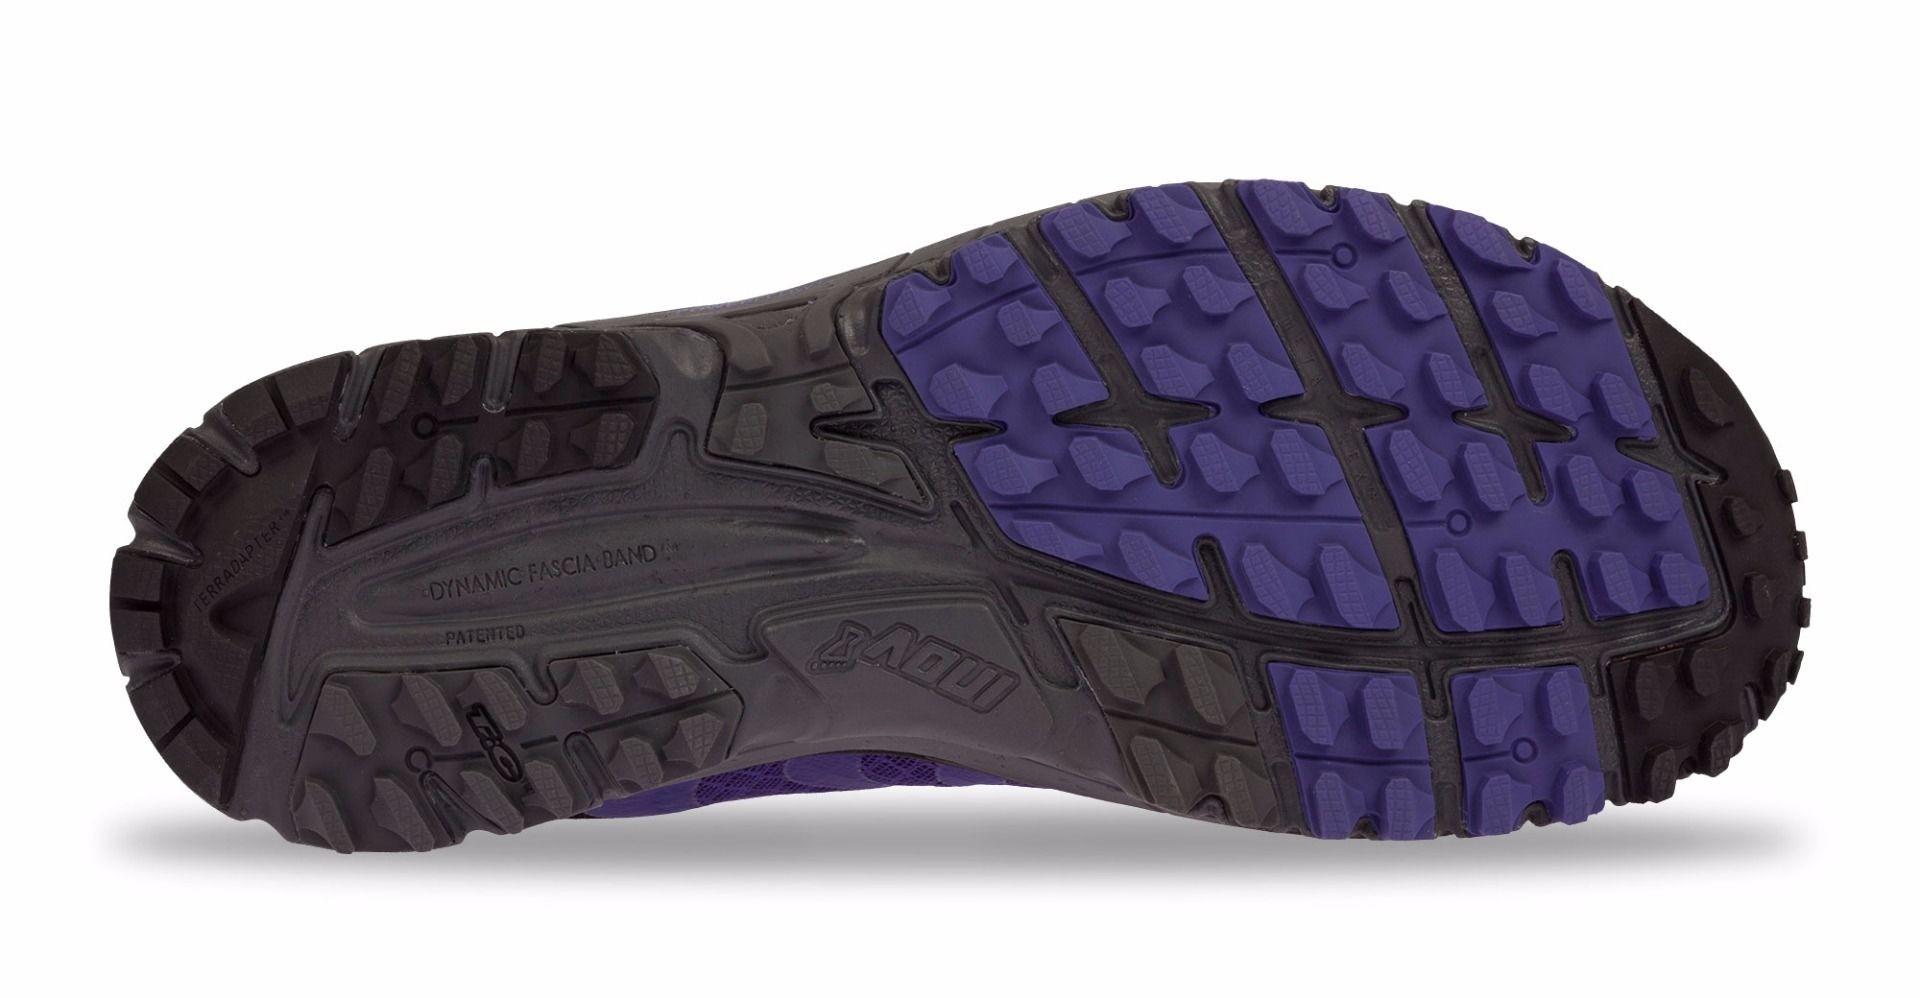 parkclaw-275-w-purple-black-sole-update_1.jpg